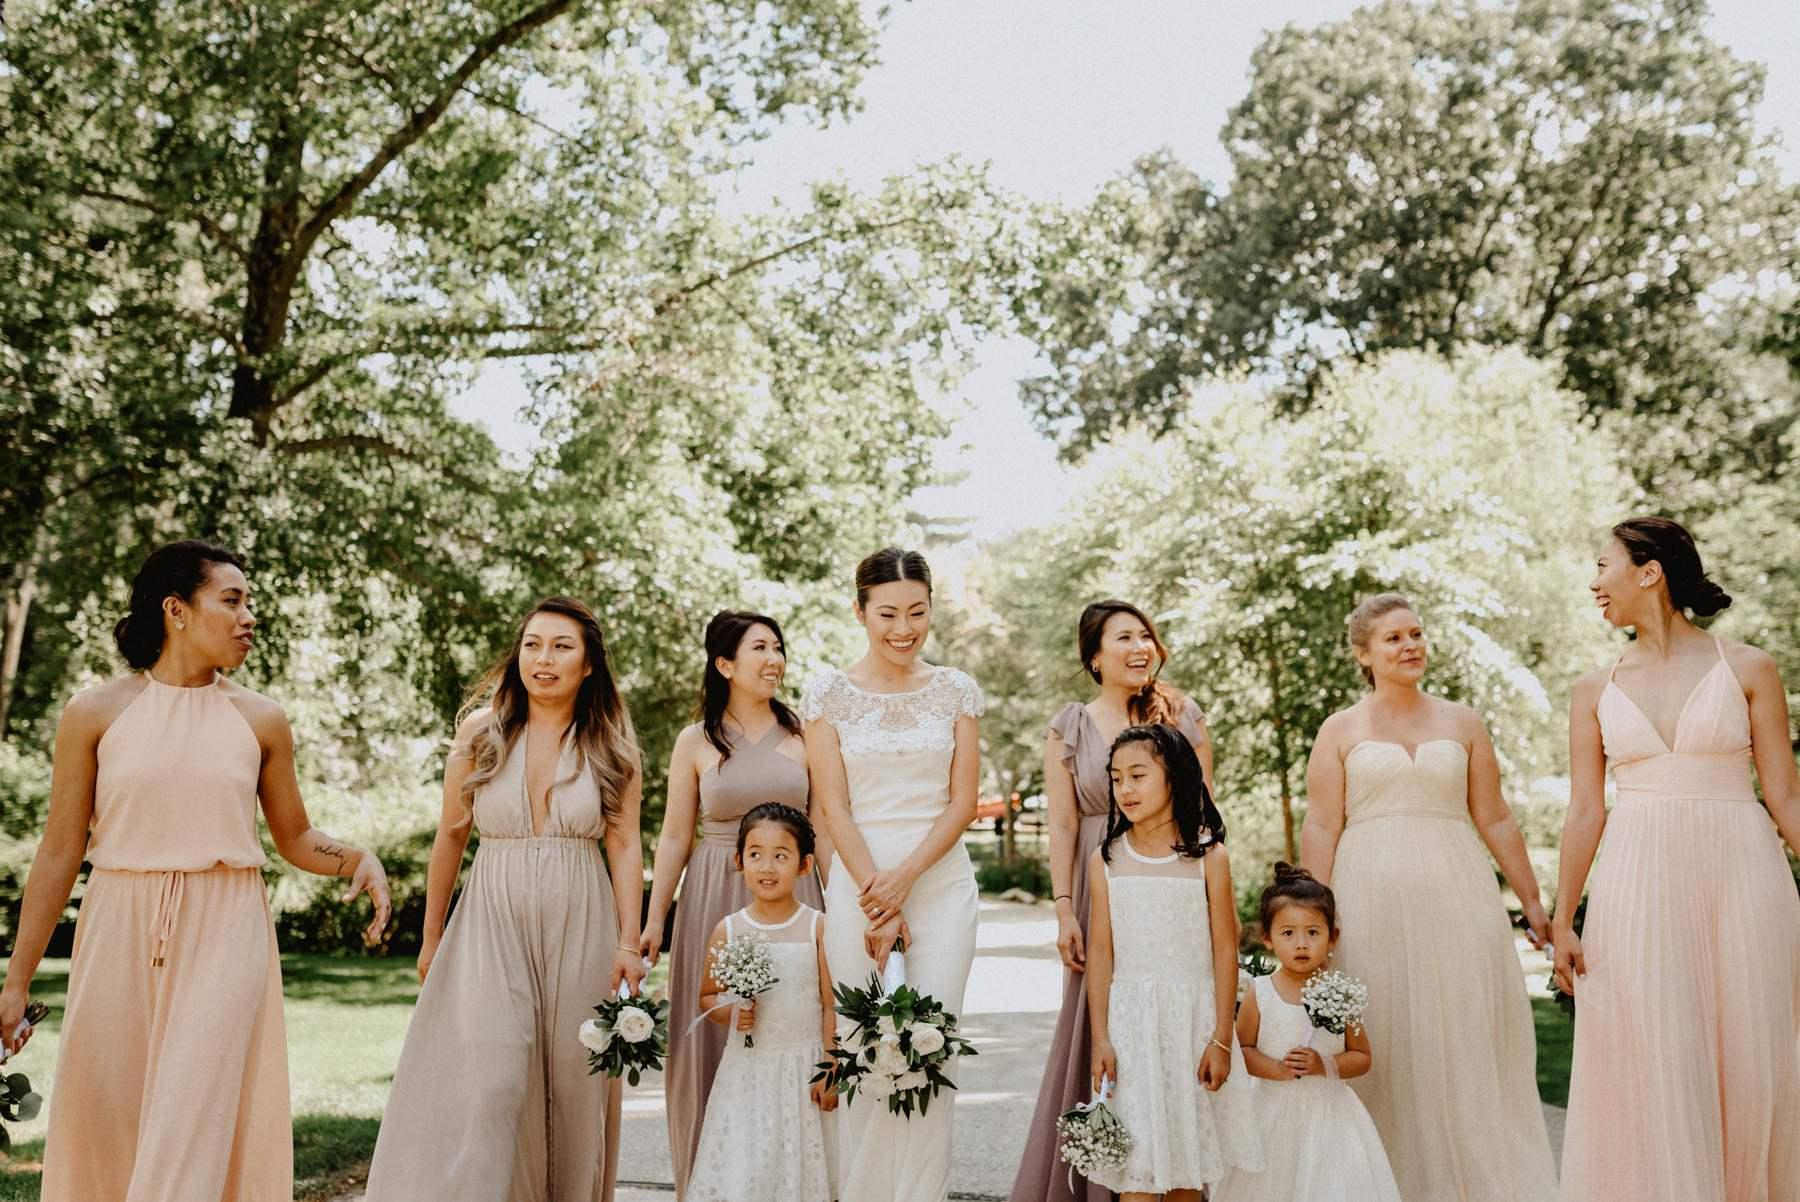 Appleford-estate-wedding-51.jpg